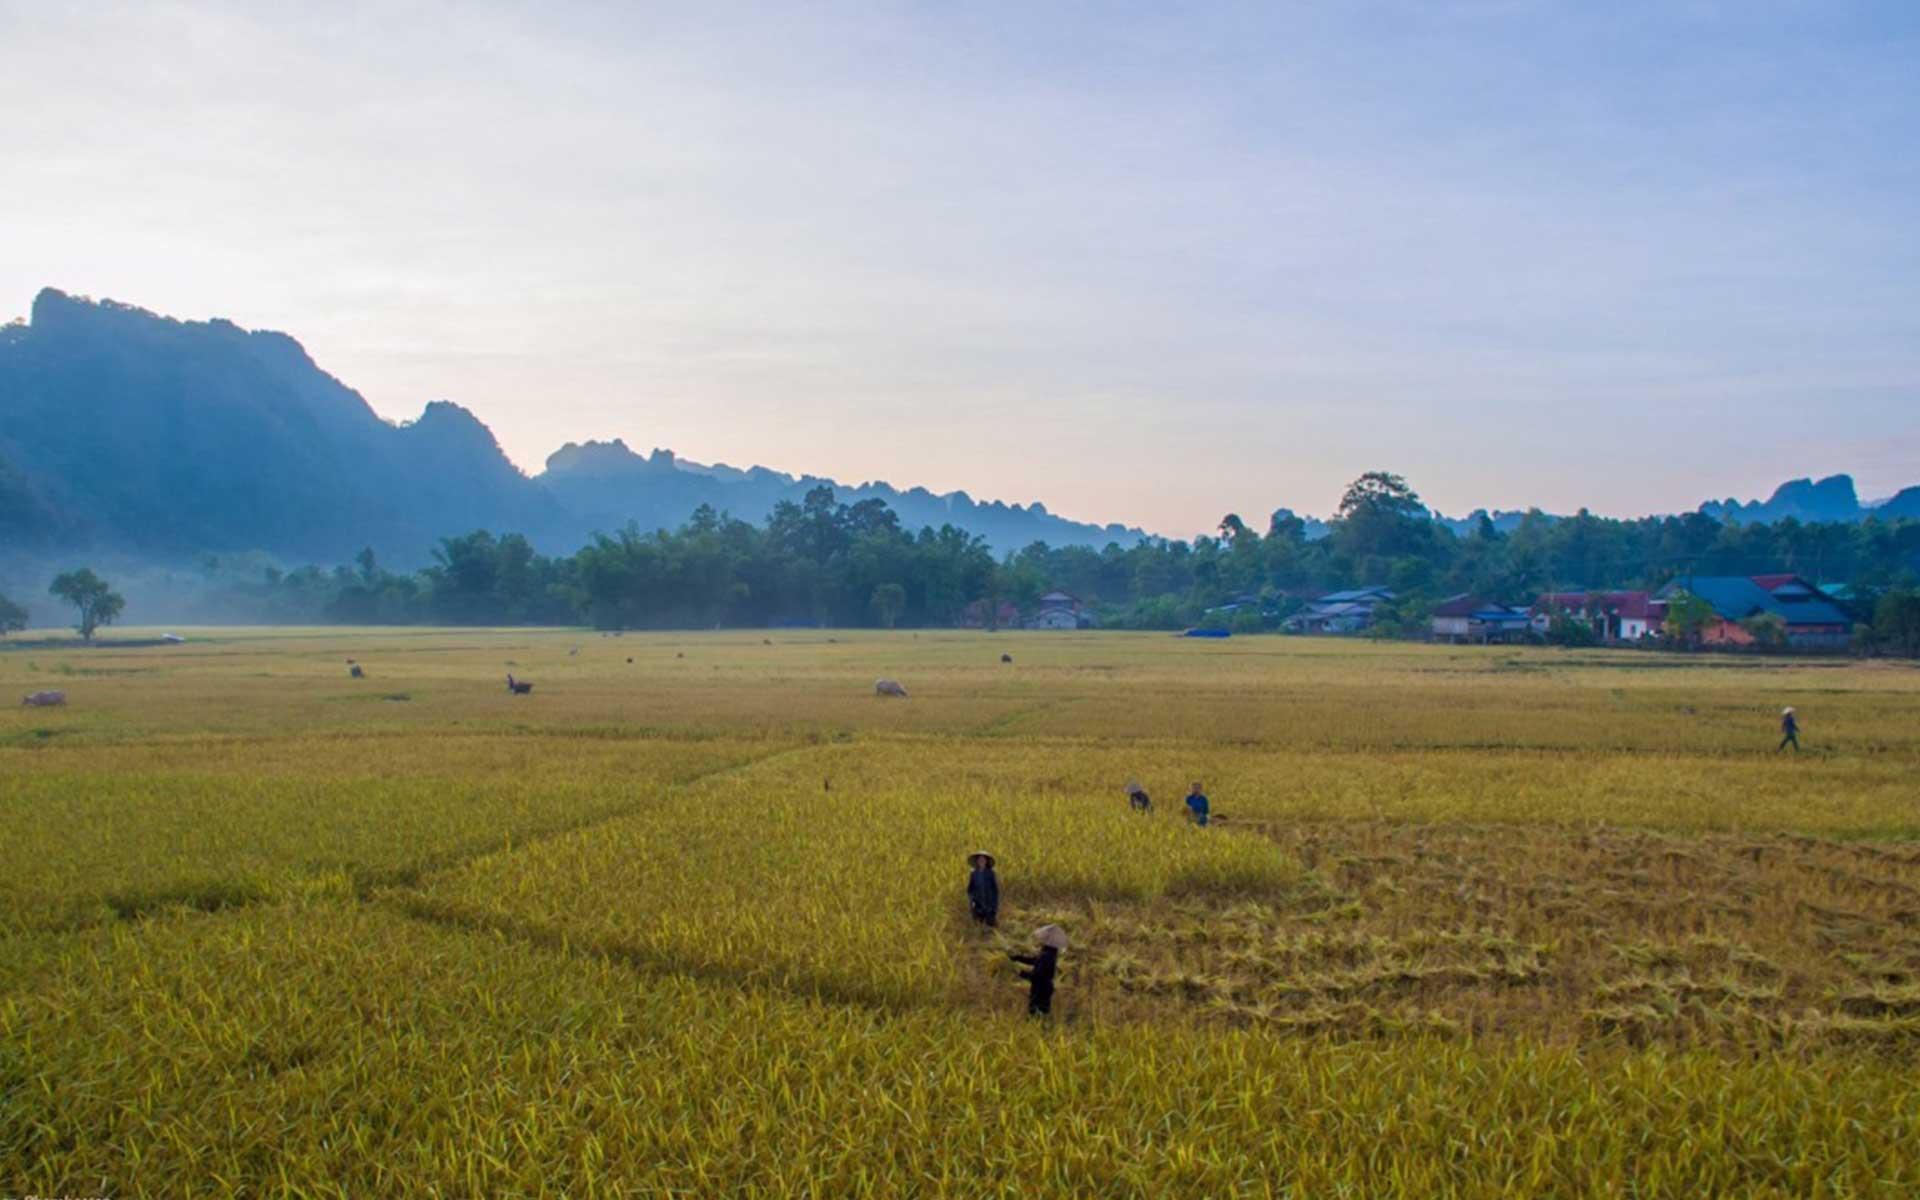 LAOS Laotravel 5 Laos Travel